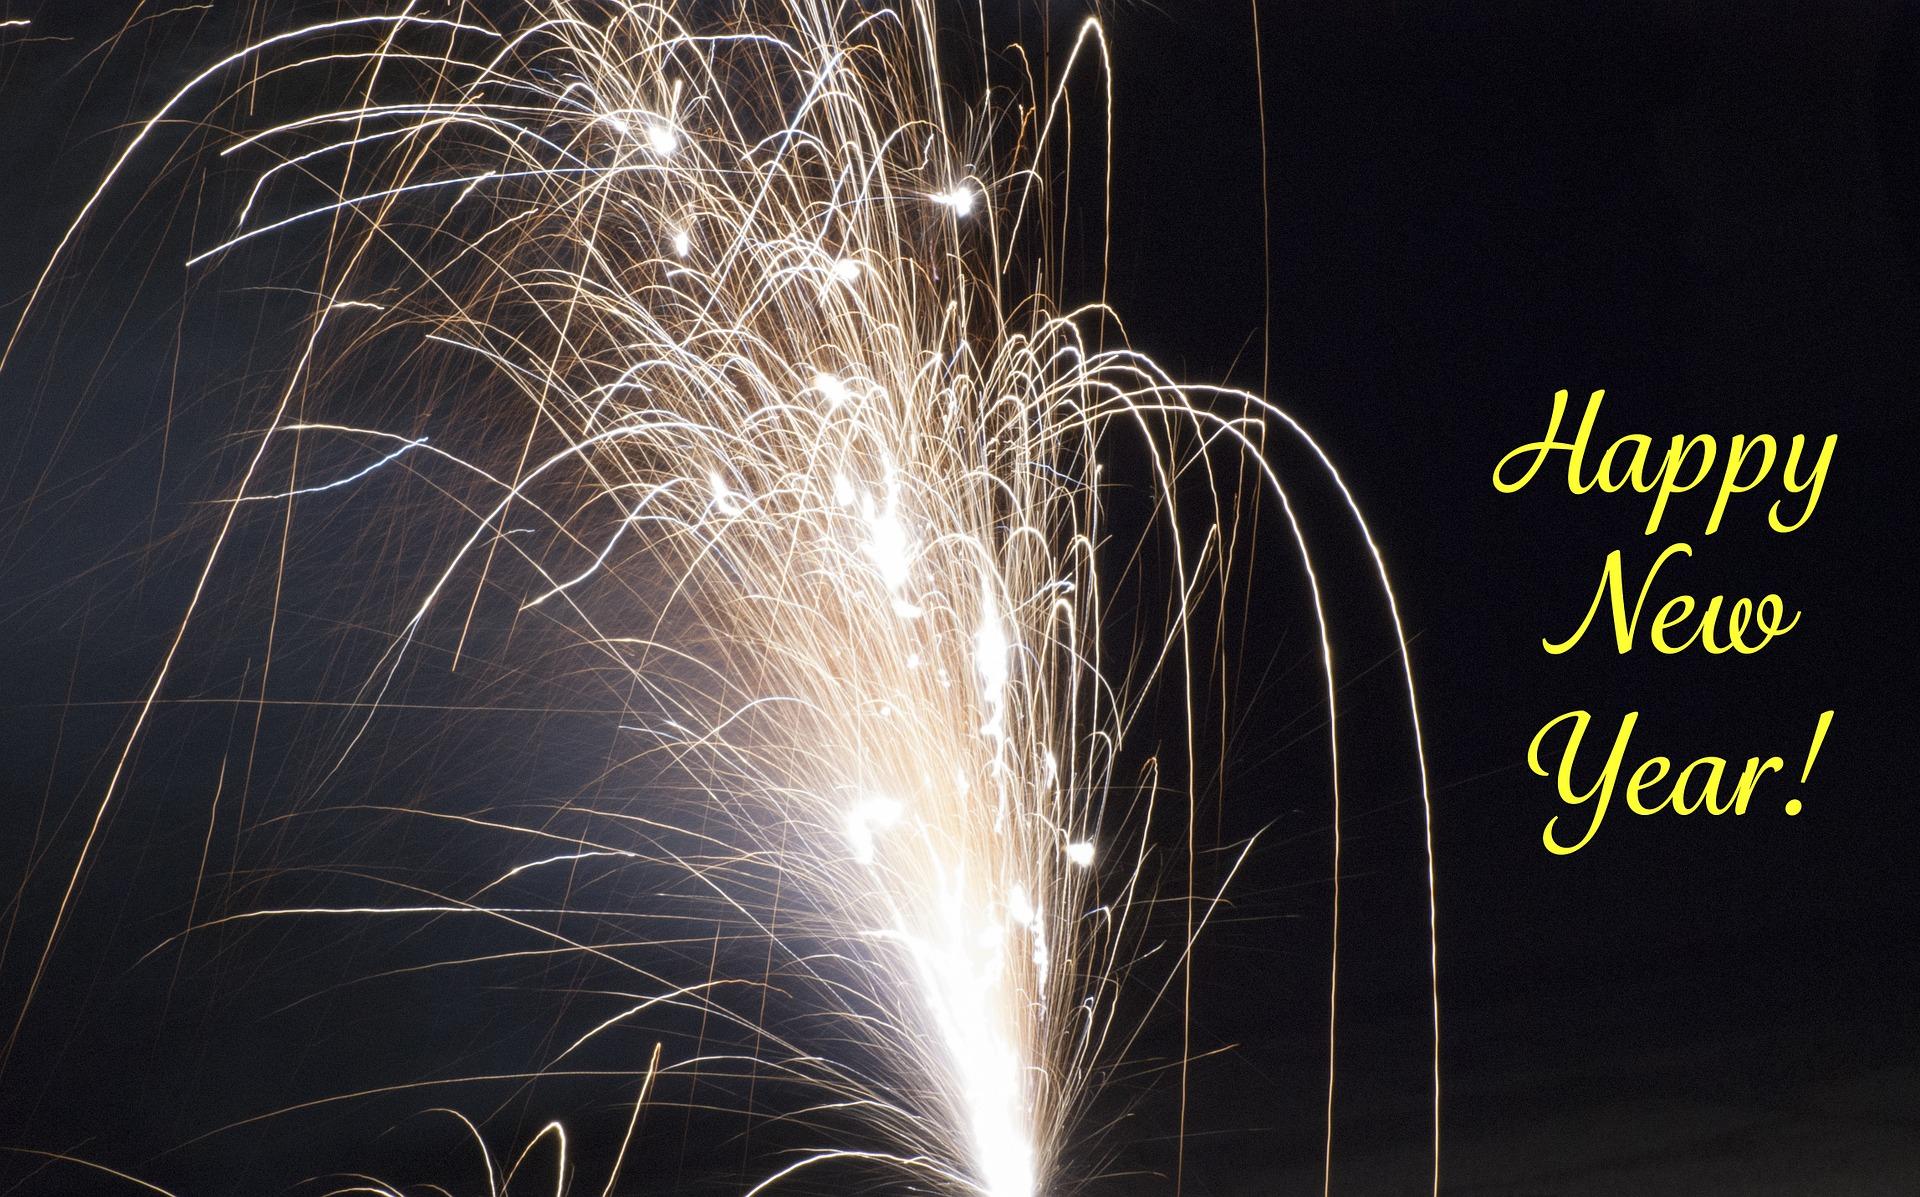 happy-new-year-1116338_1920